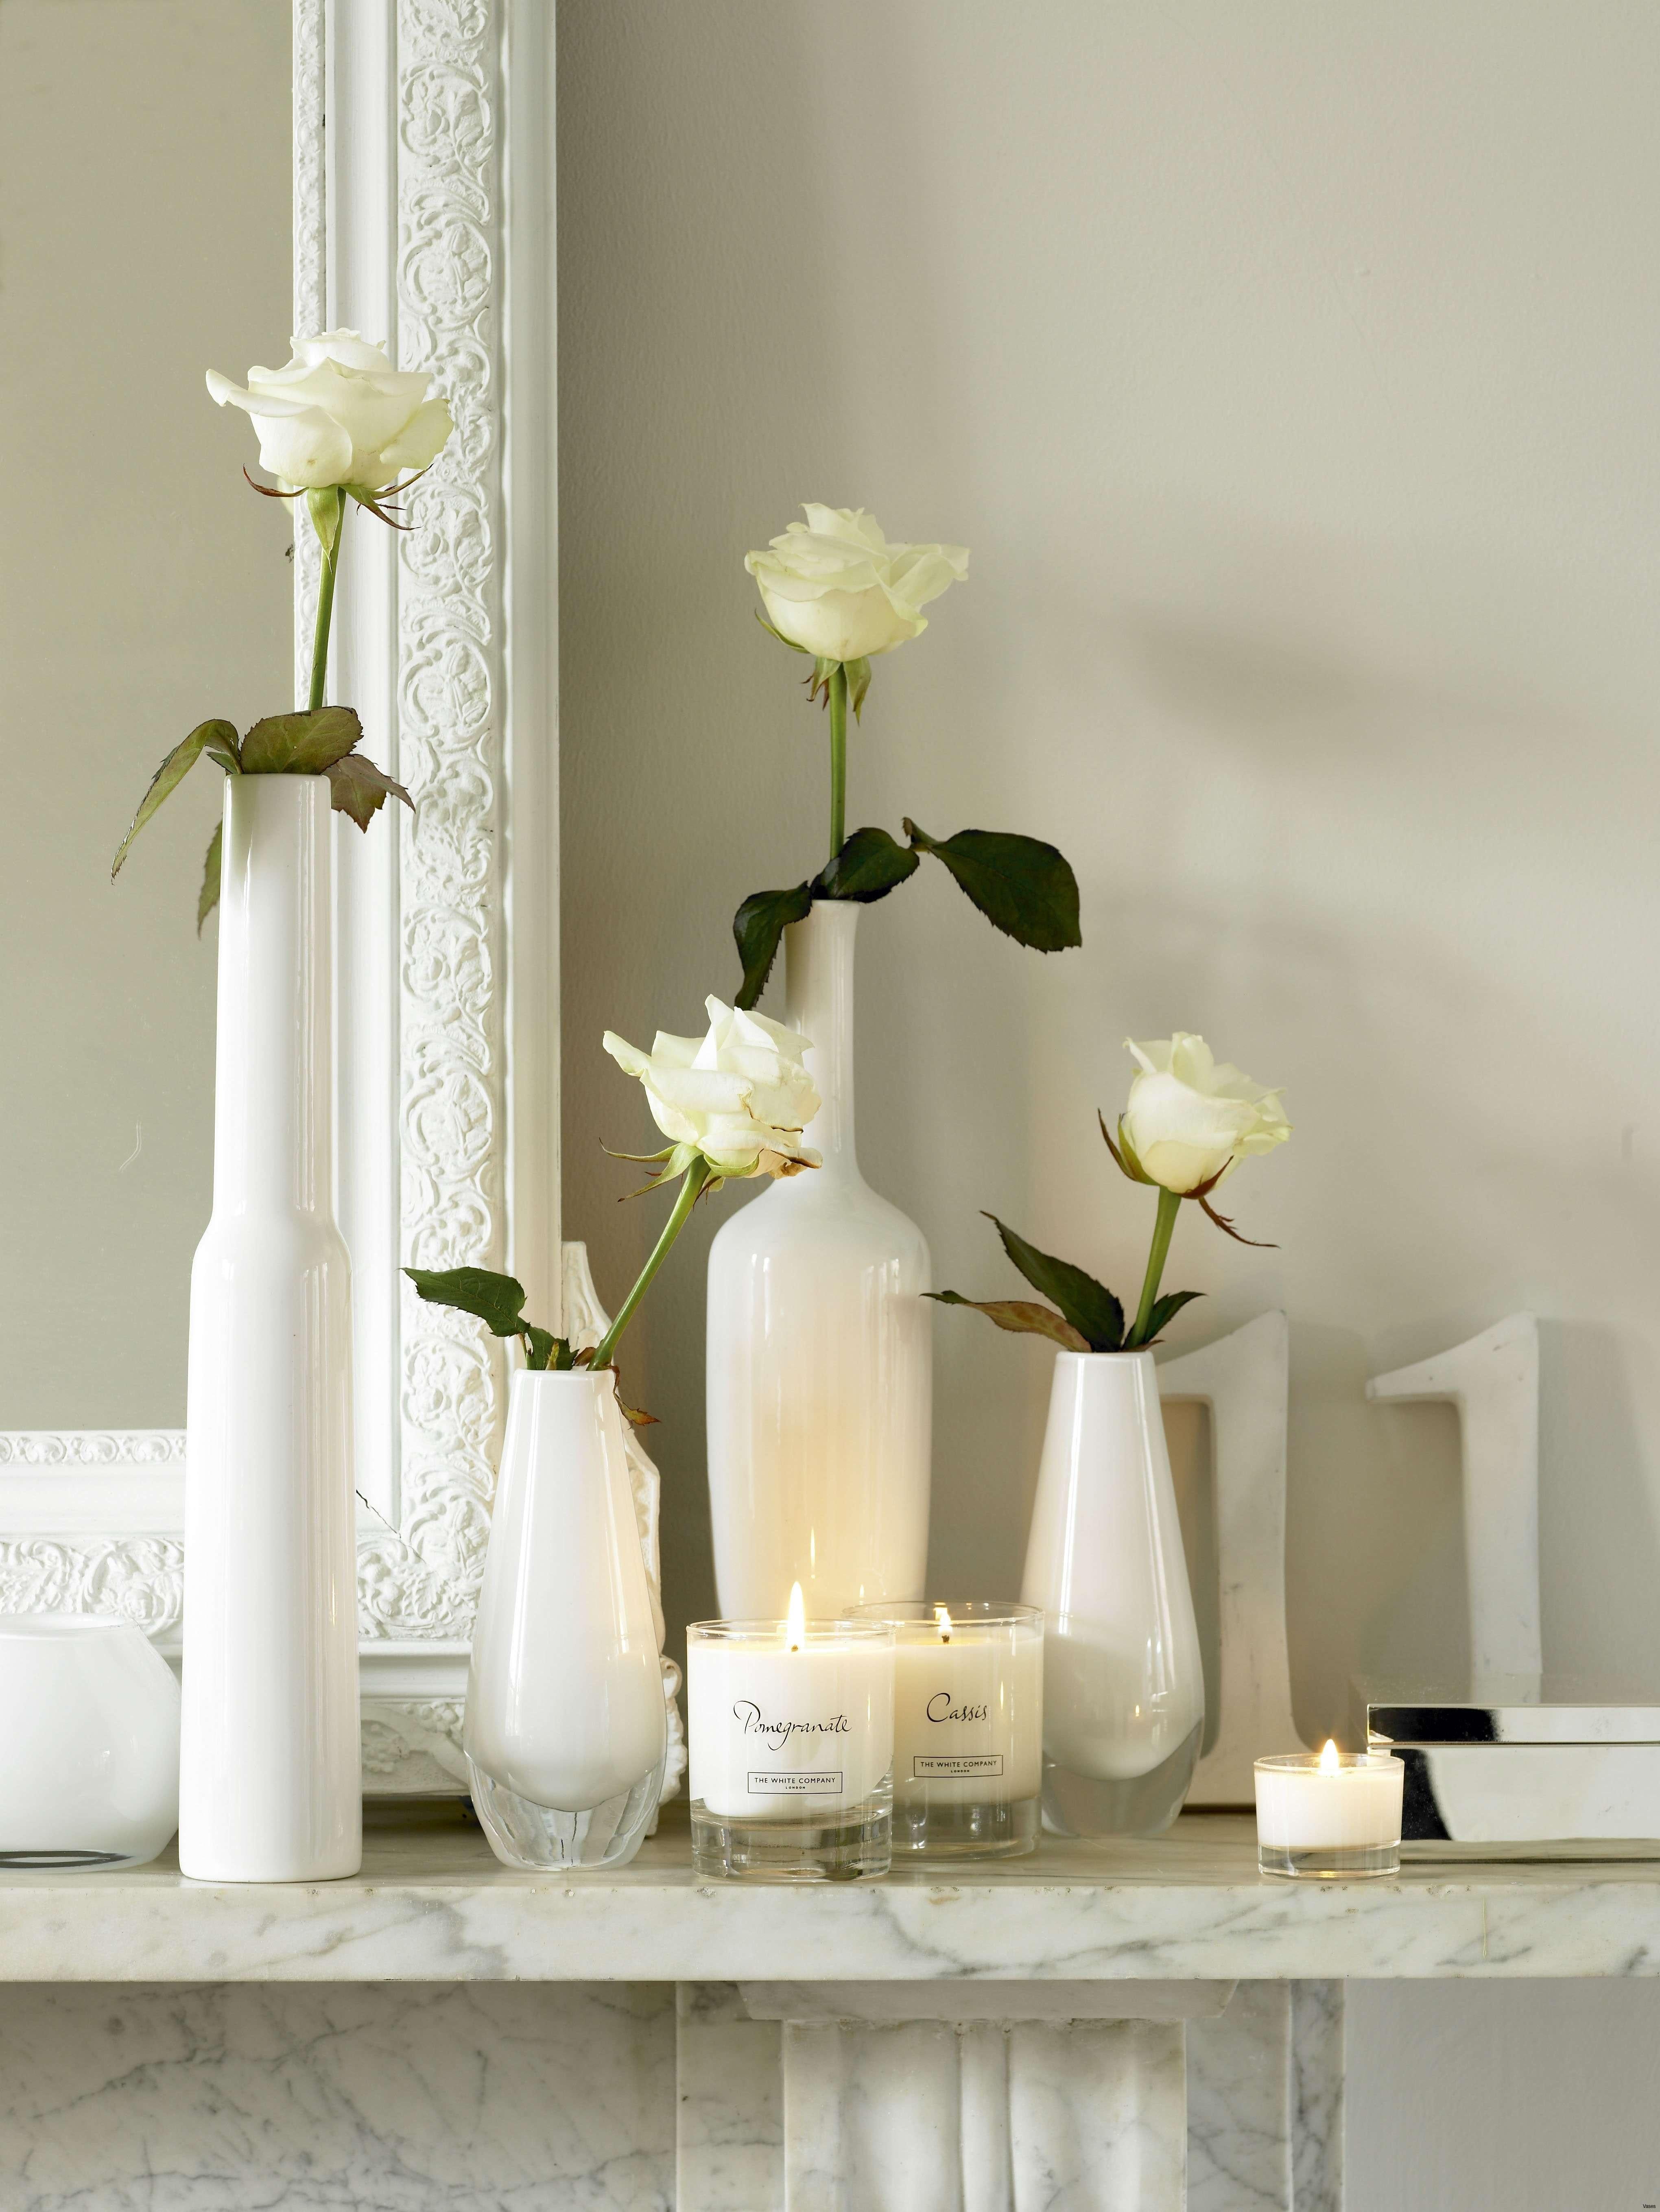 Diy Vase Decor Of Inspi Deco Best Diy Home Decor Vaseh Vases Decorative Flower Ideas I Inside Inspi Deco Best Vases Decoration H Decorationi 0d Ideas Decorating for Inspiration Images Of Inspi Deco